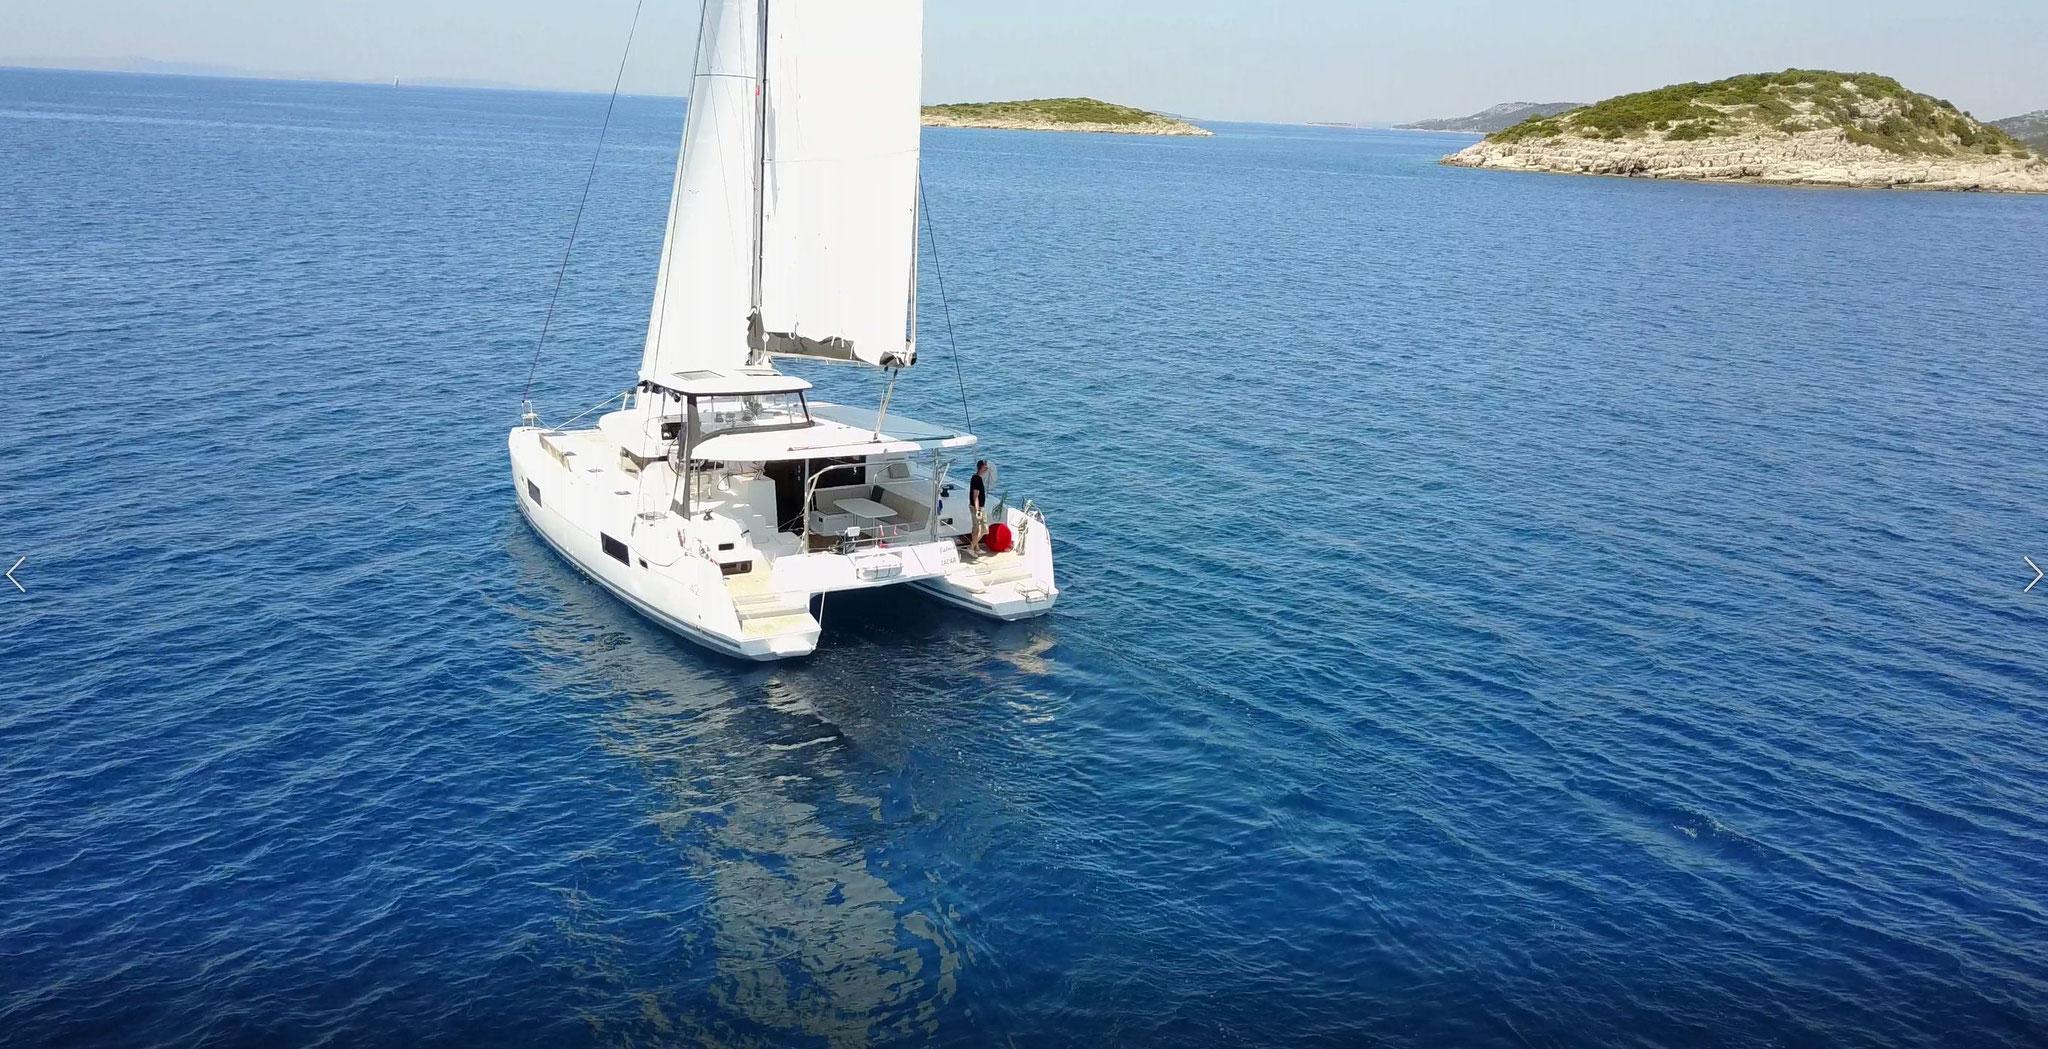 Katamaran Reisen als Charter Kroatien - www.katamaramtraum.com